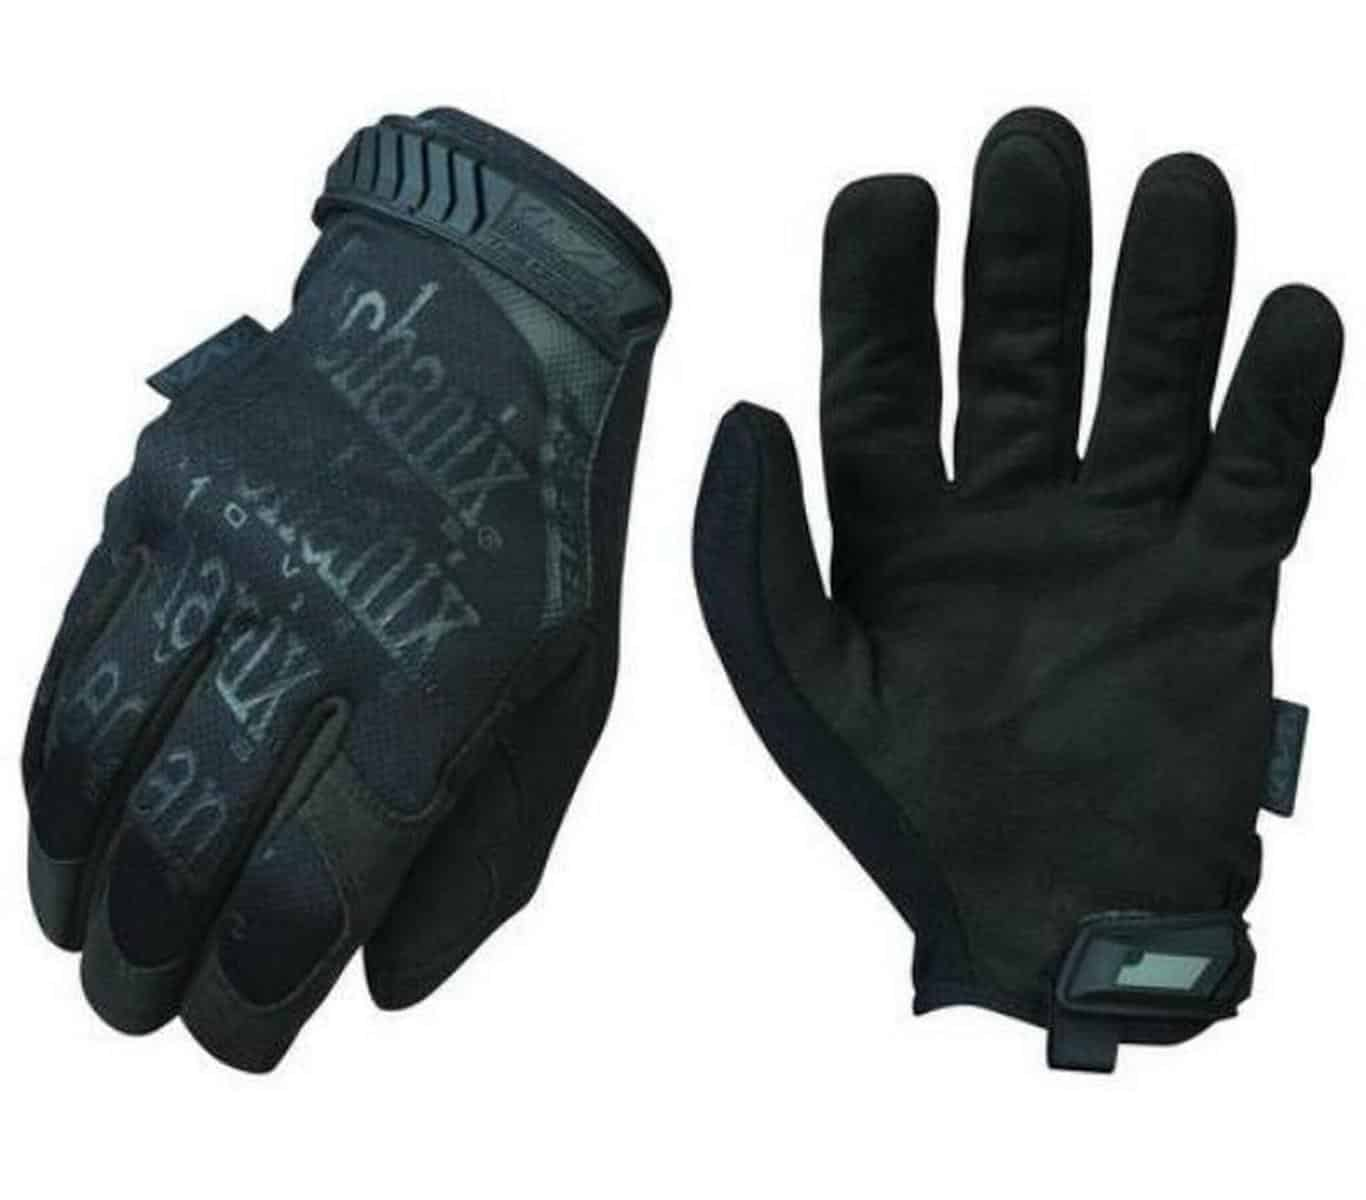 Mechanix Wear MG-95-010 Insulated Winter Tactical Gloves